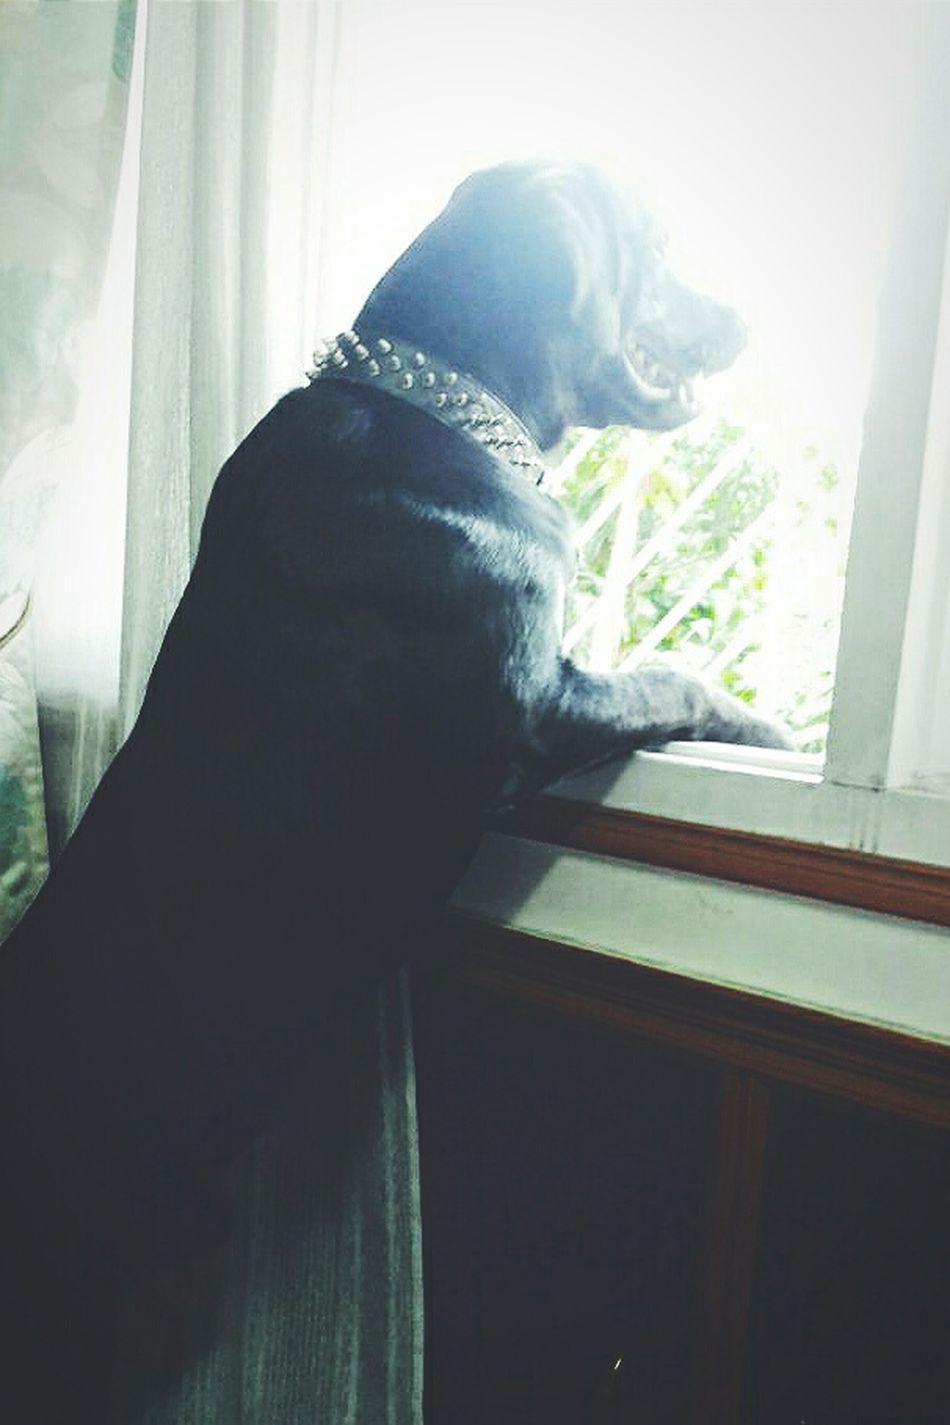 Letmeseethis Sobeautifuloutside Dog Love Dogportrait